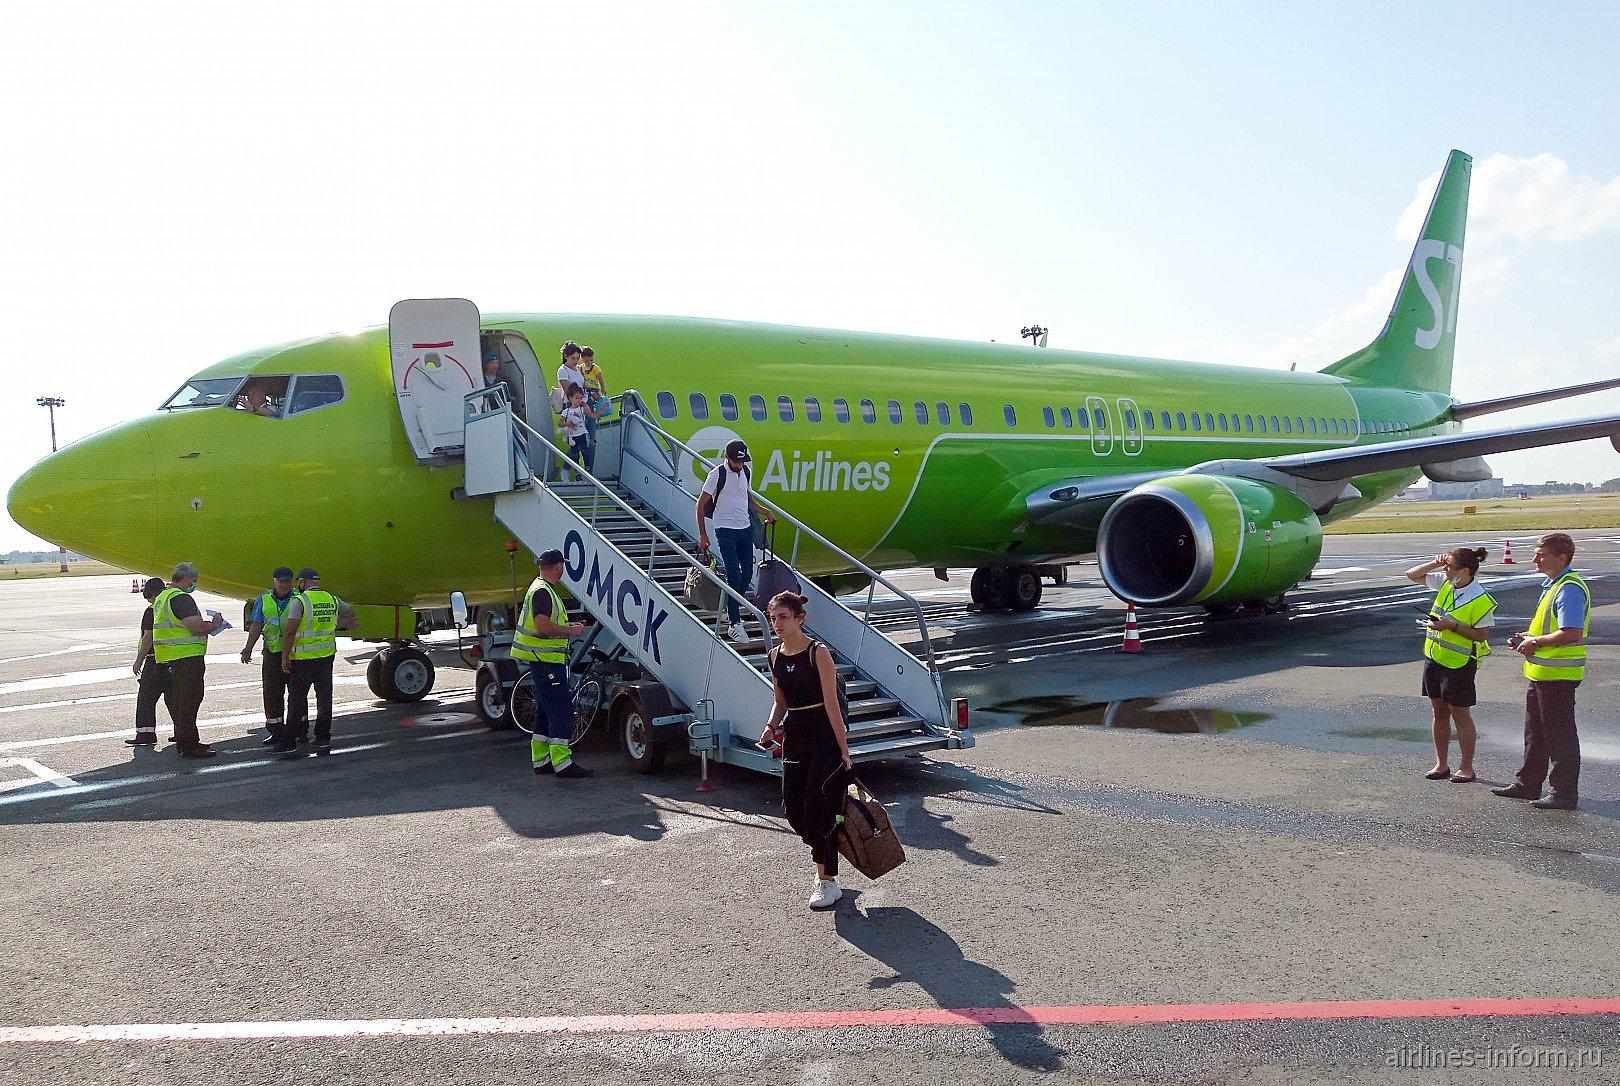 Москва - Омск, S7 (Сибирь), Boeing 737-800, VP-BQD